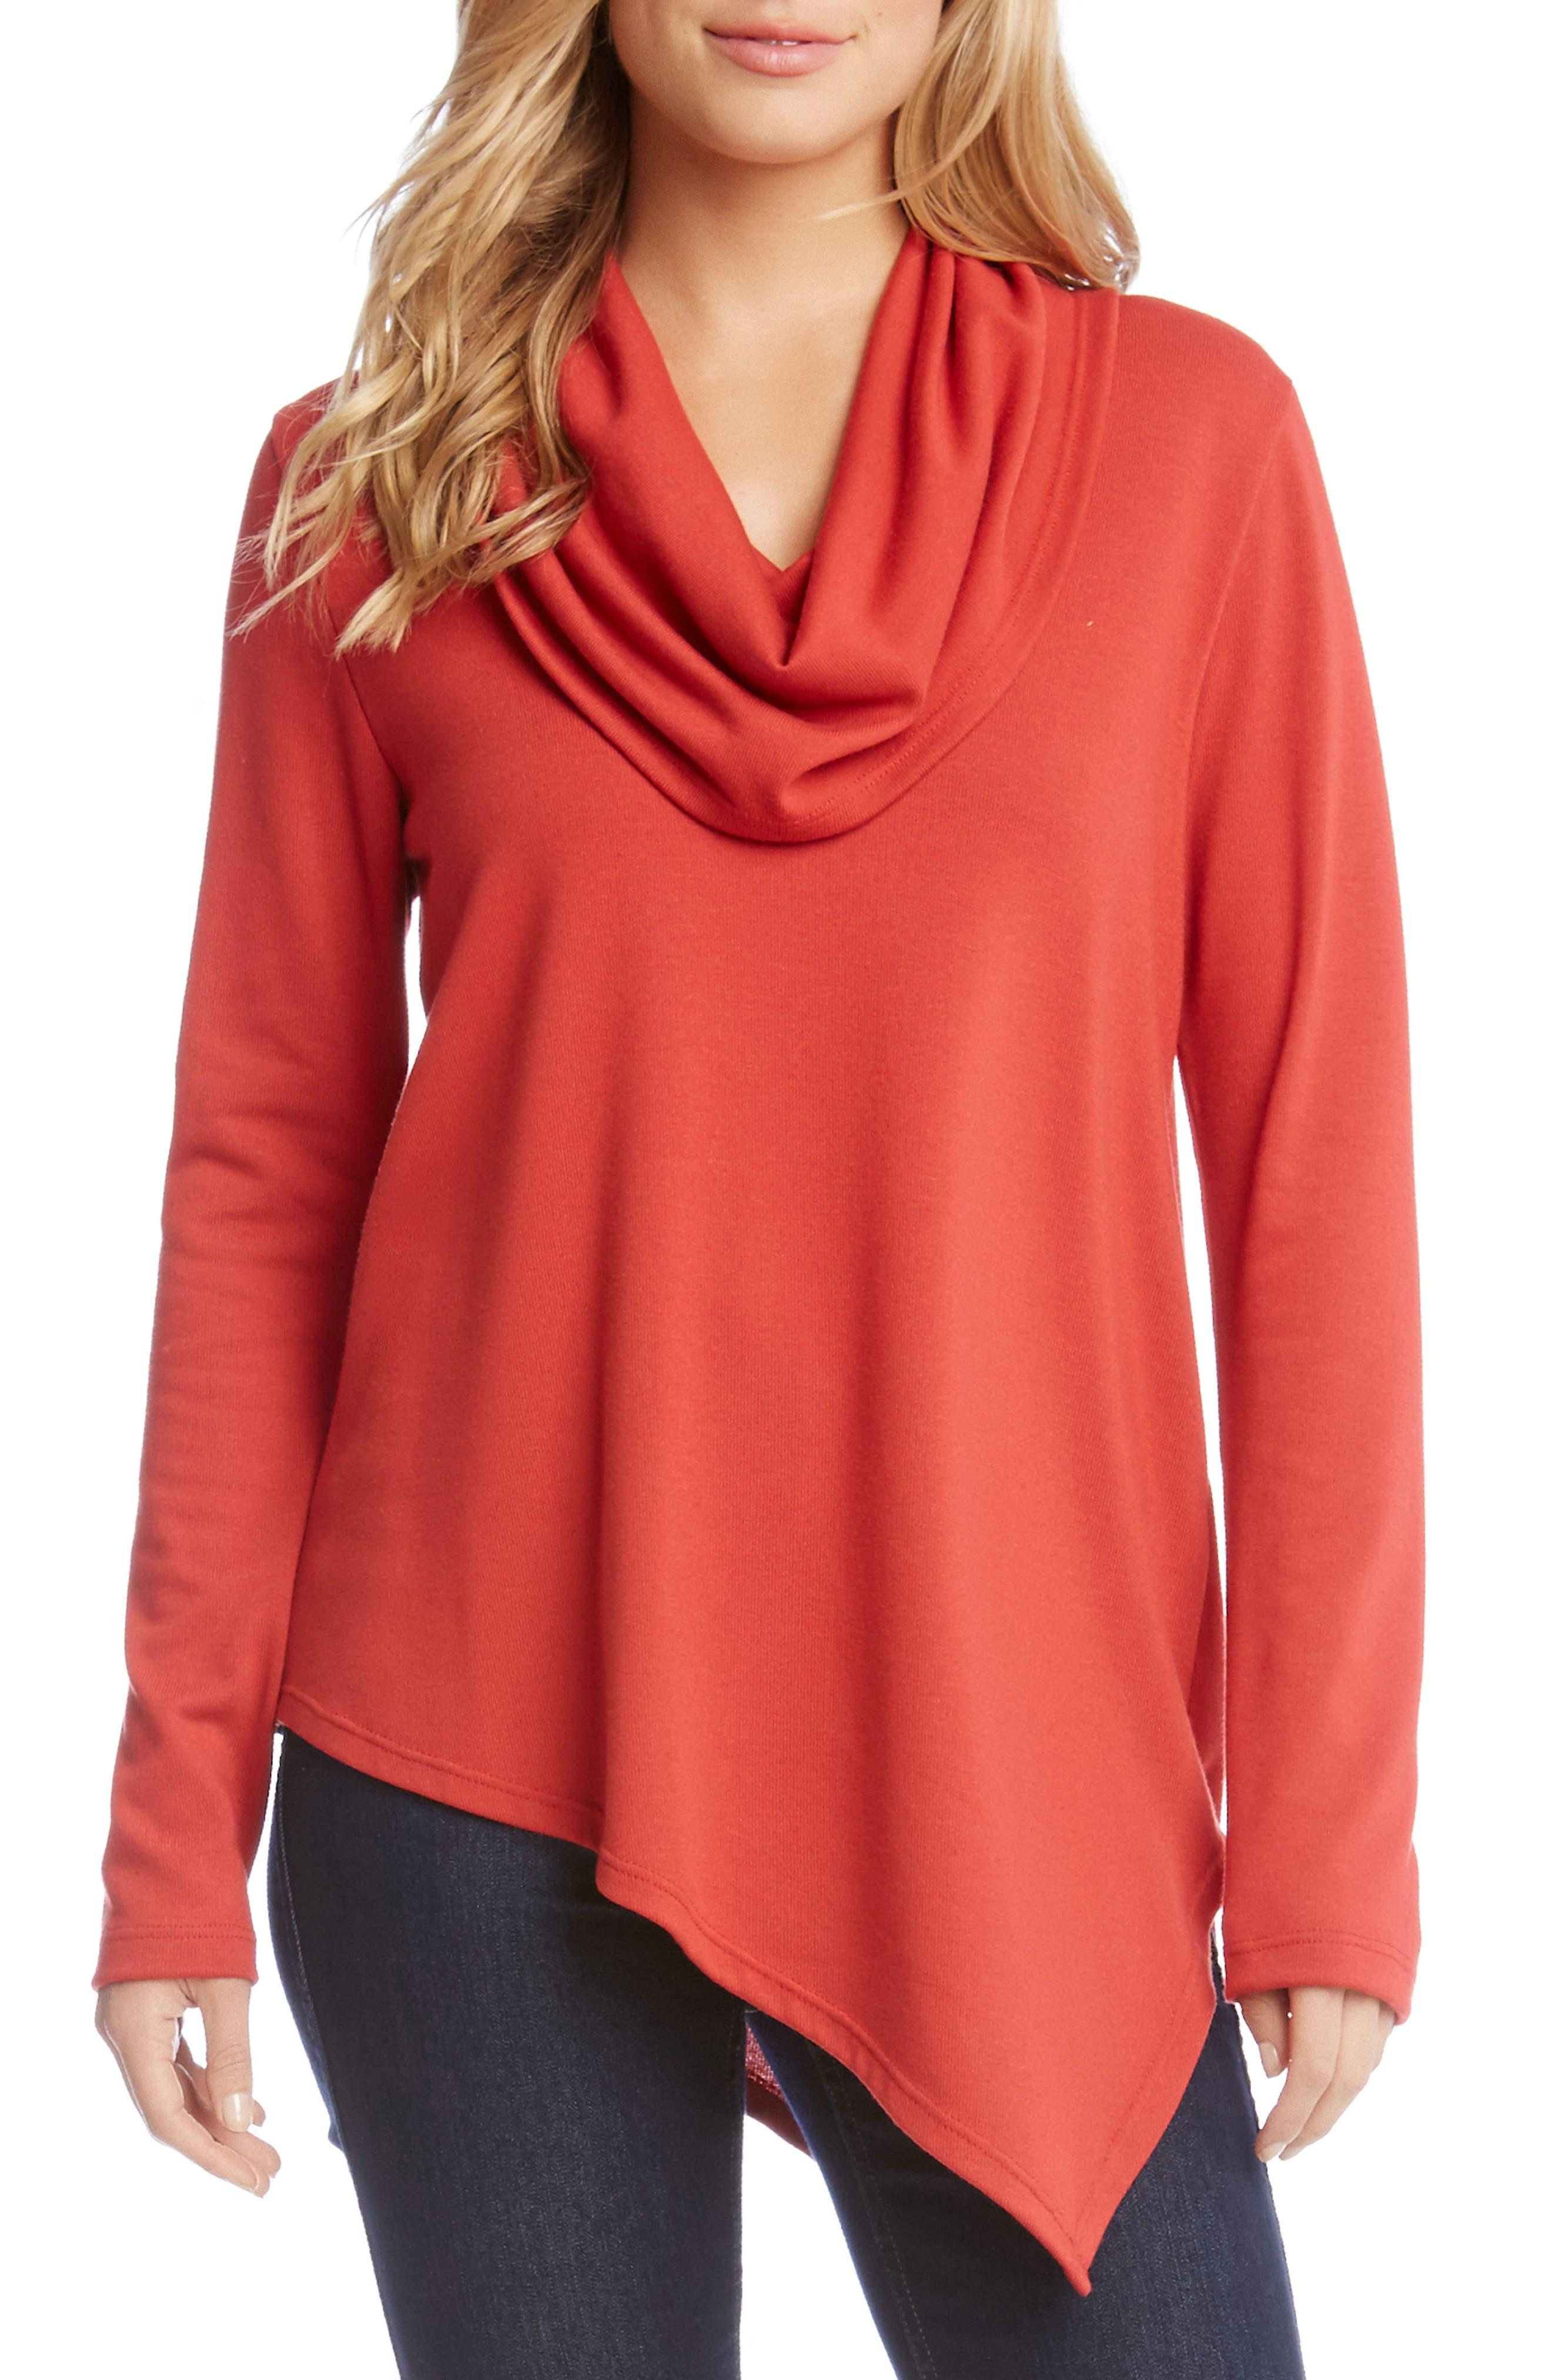 Alternate Image 1 Selected - Karen Kane Cowl Neck Asymmetrical Sweater